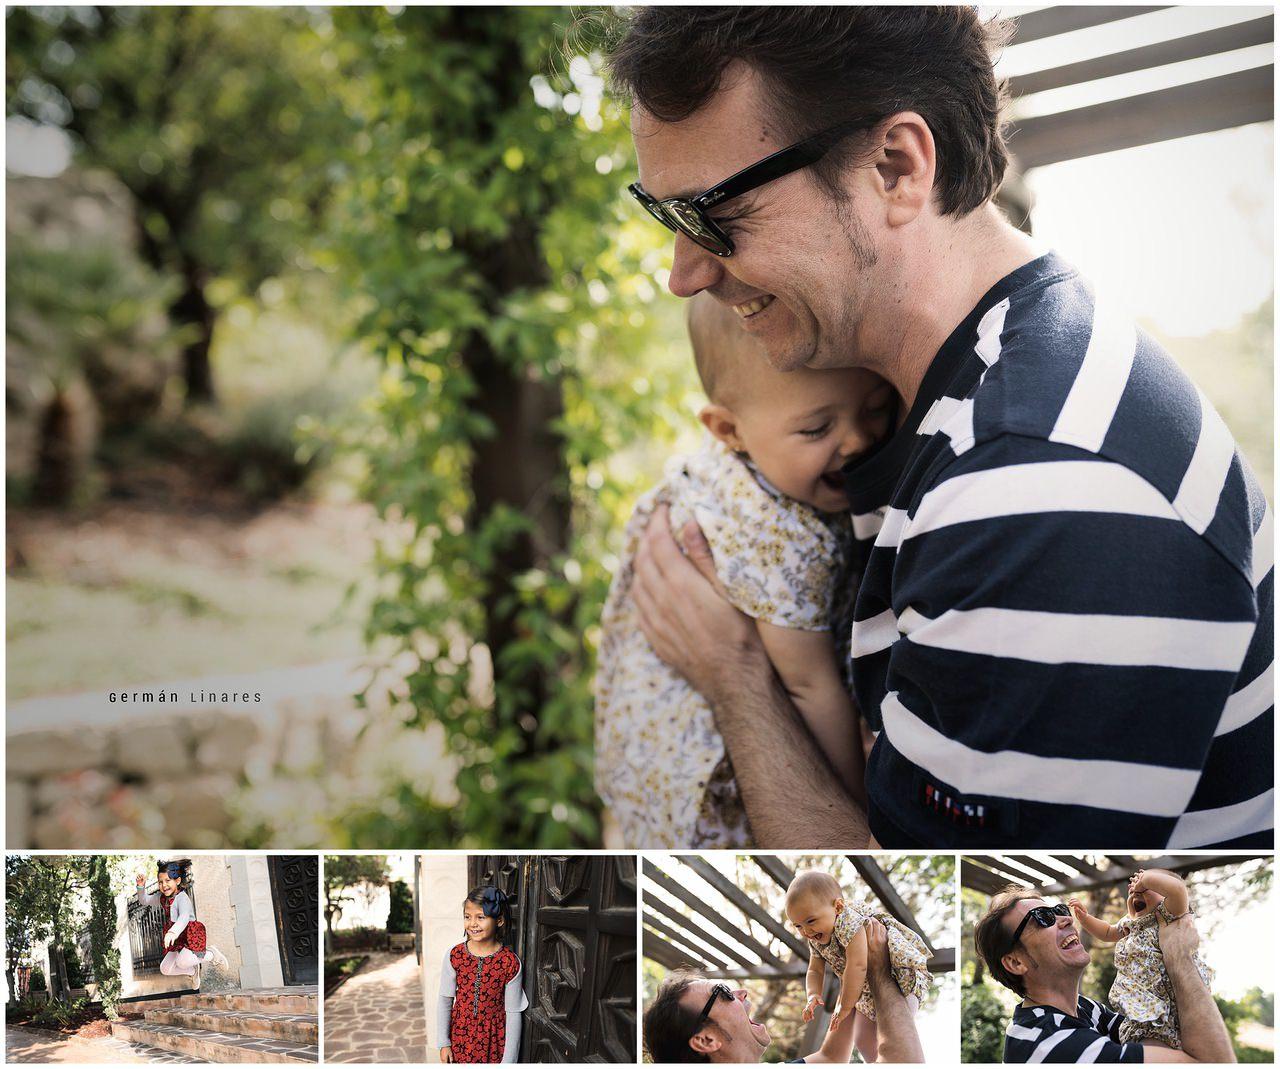 fotografo de bodas en alcoy, fotos familia onil3